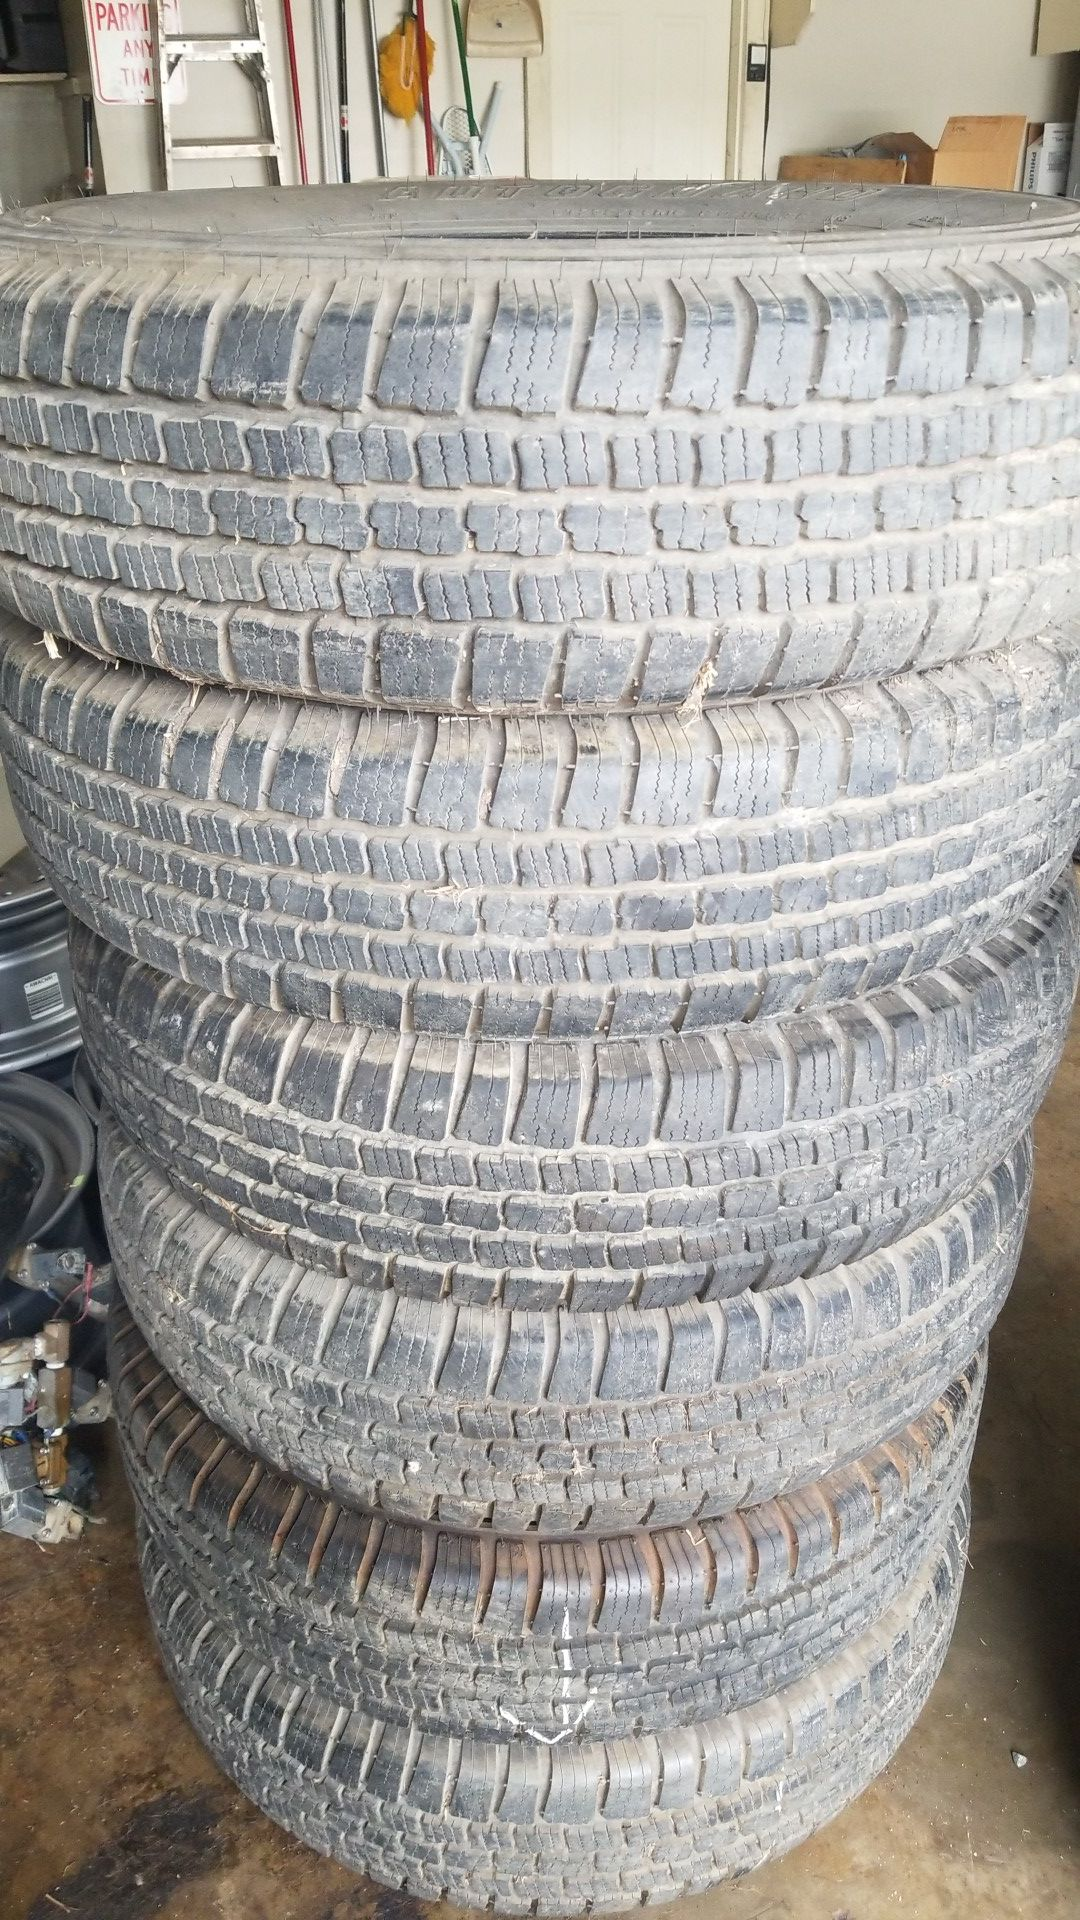 (6) 235/85 R16 Autoguard dually tires